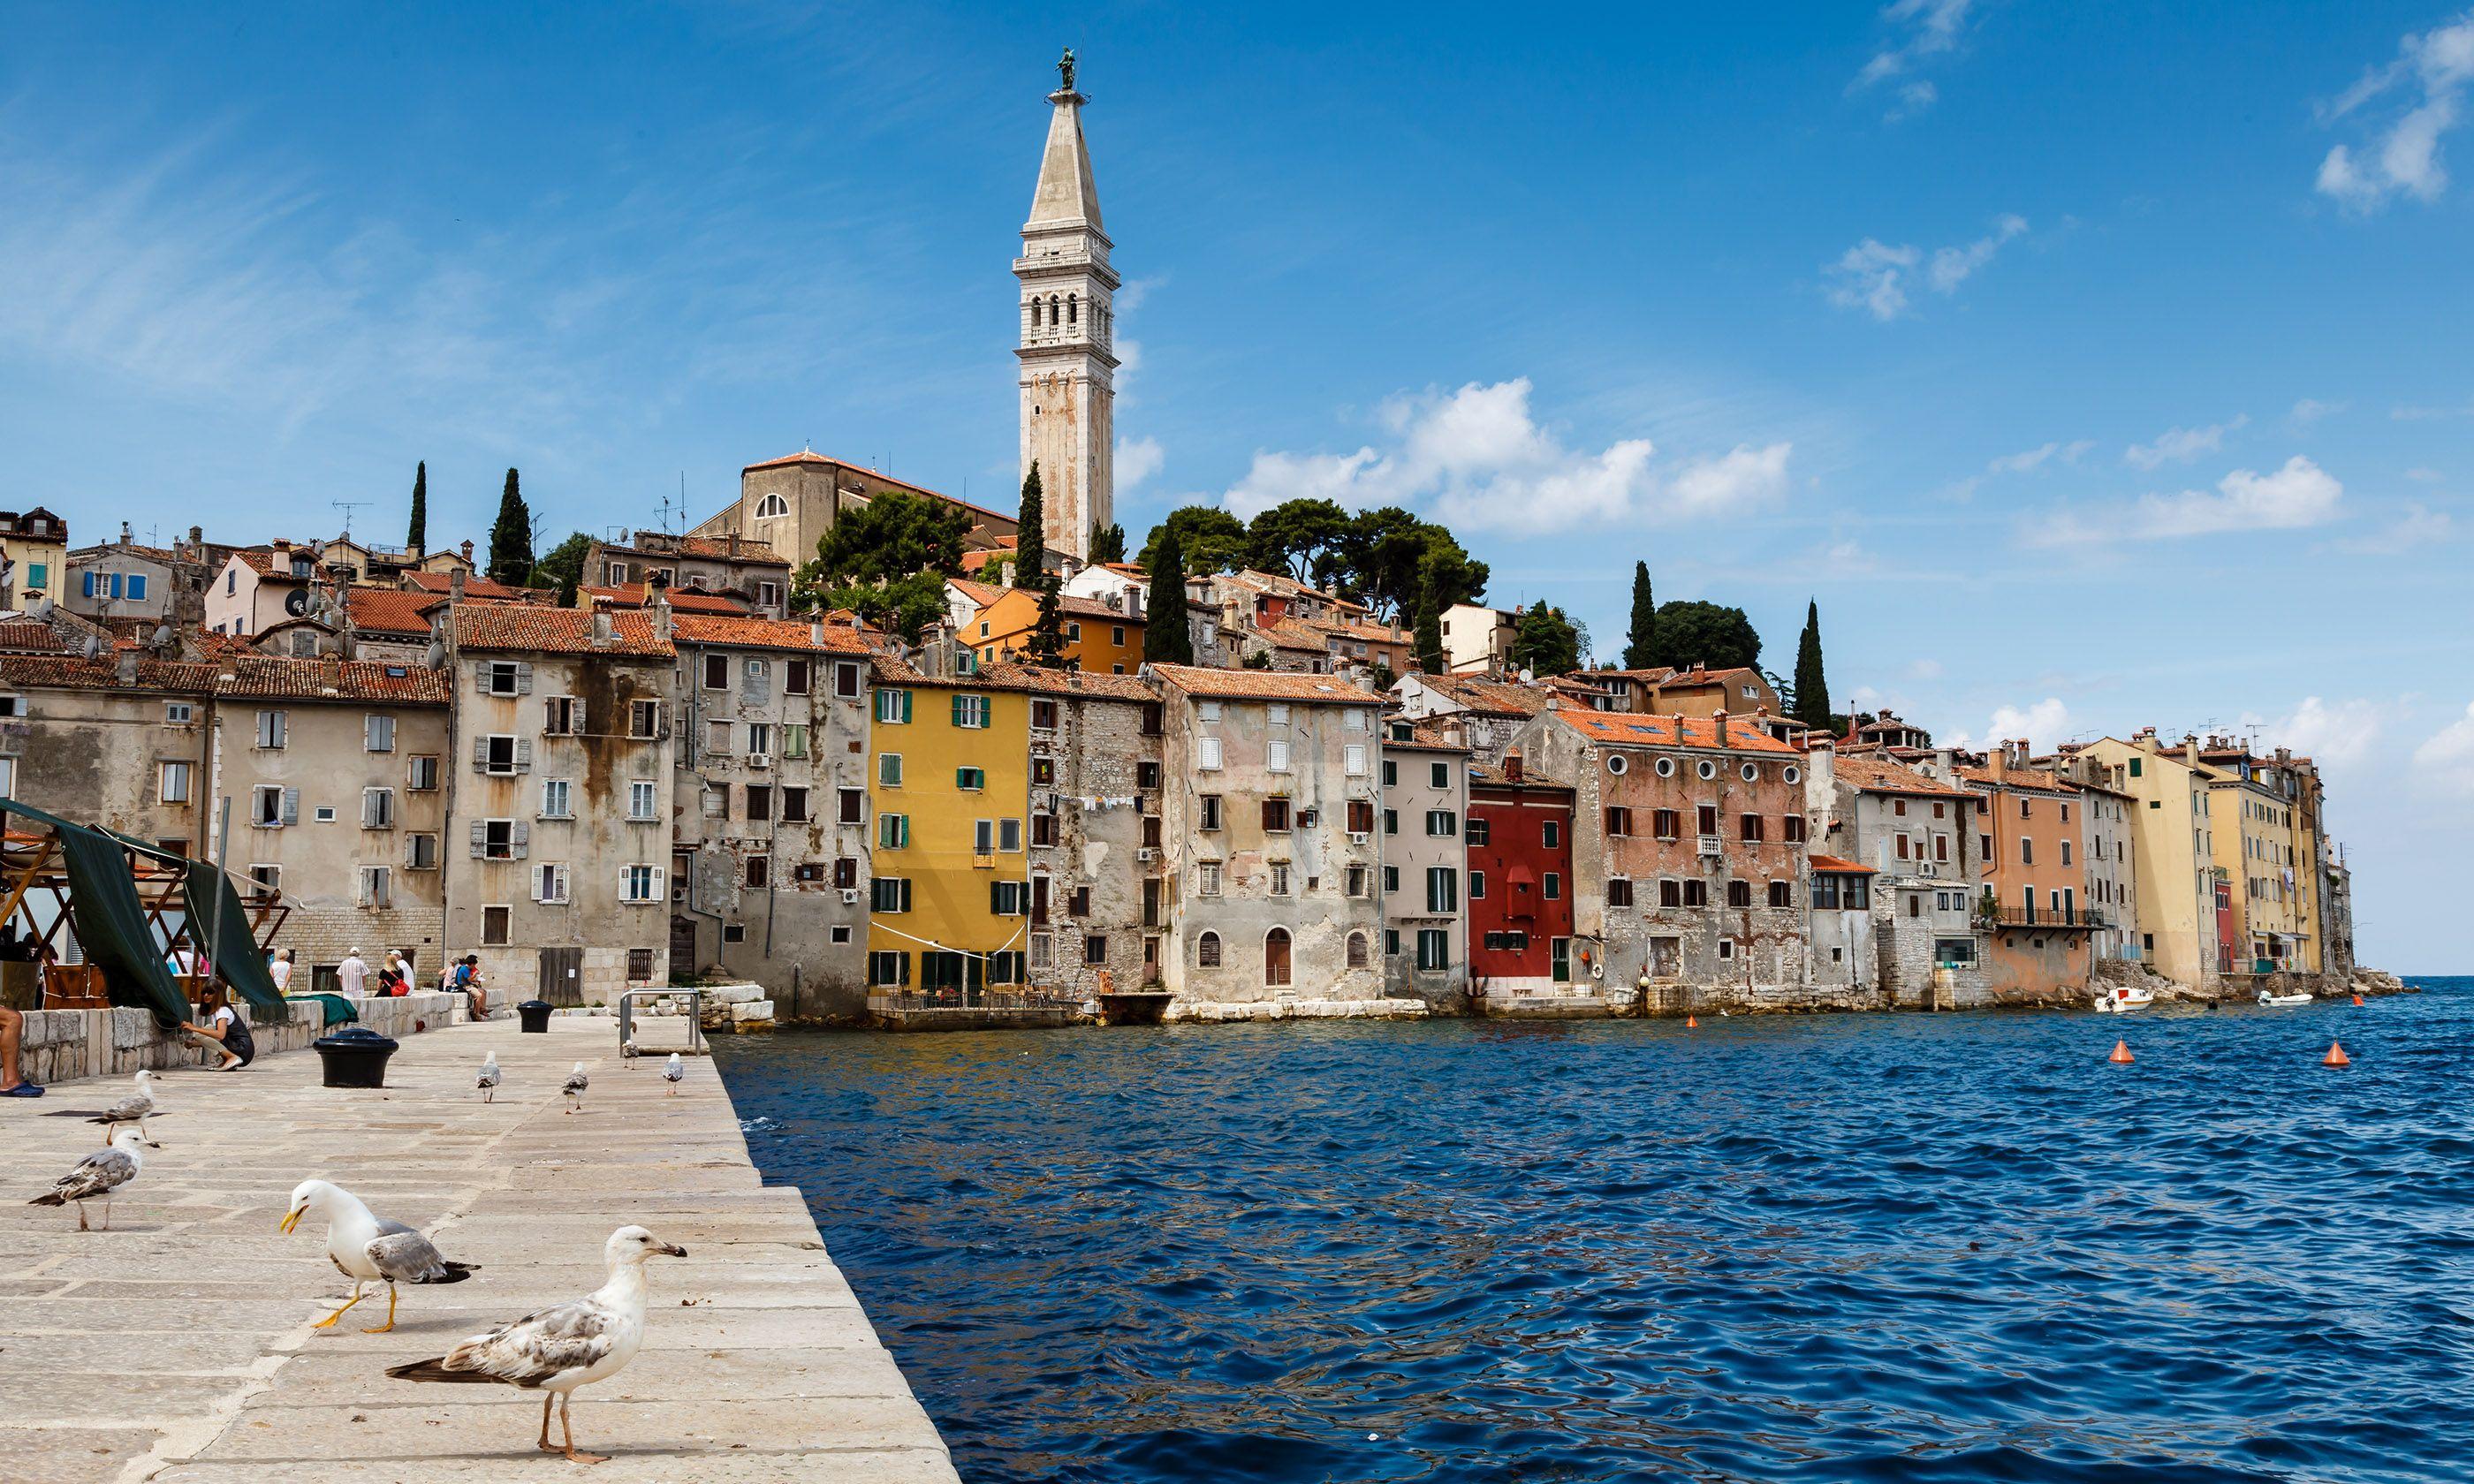 Rovinj, Croatia (Shutterstock.com)